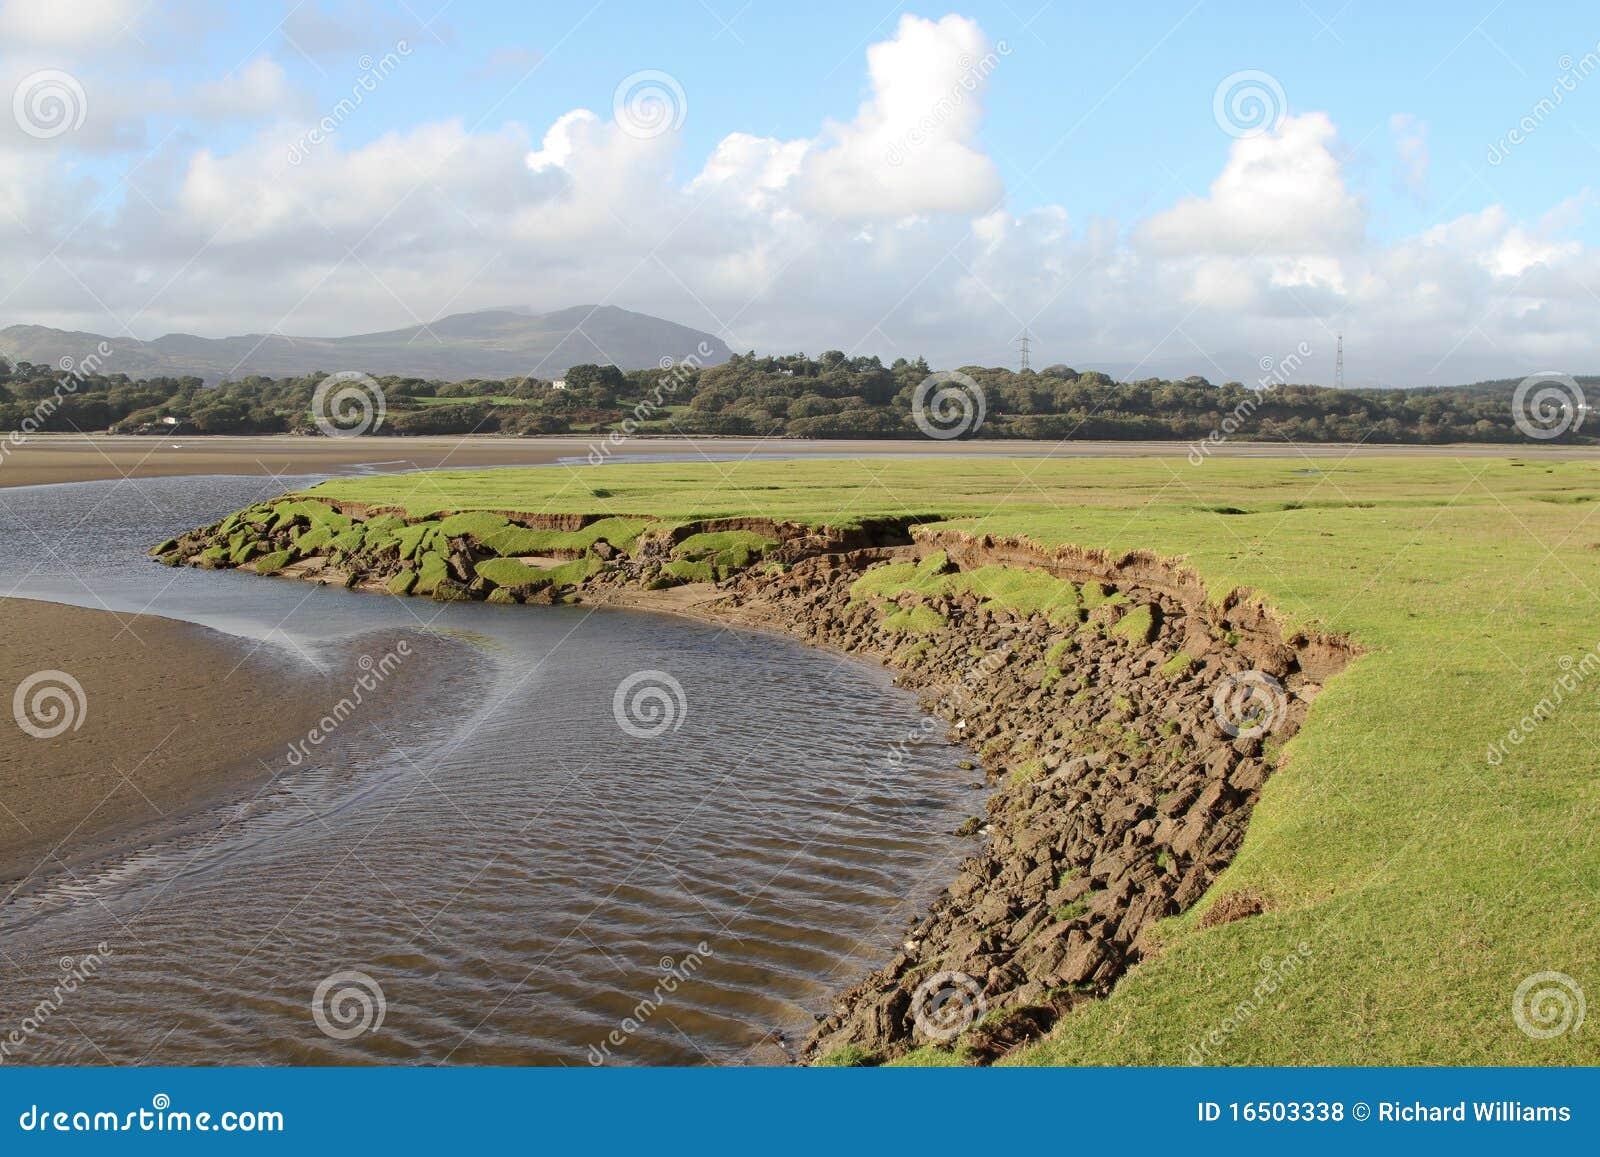 Land erosion royalty free stock photos image 16503338 for Soil erosion in hindi